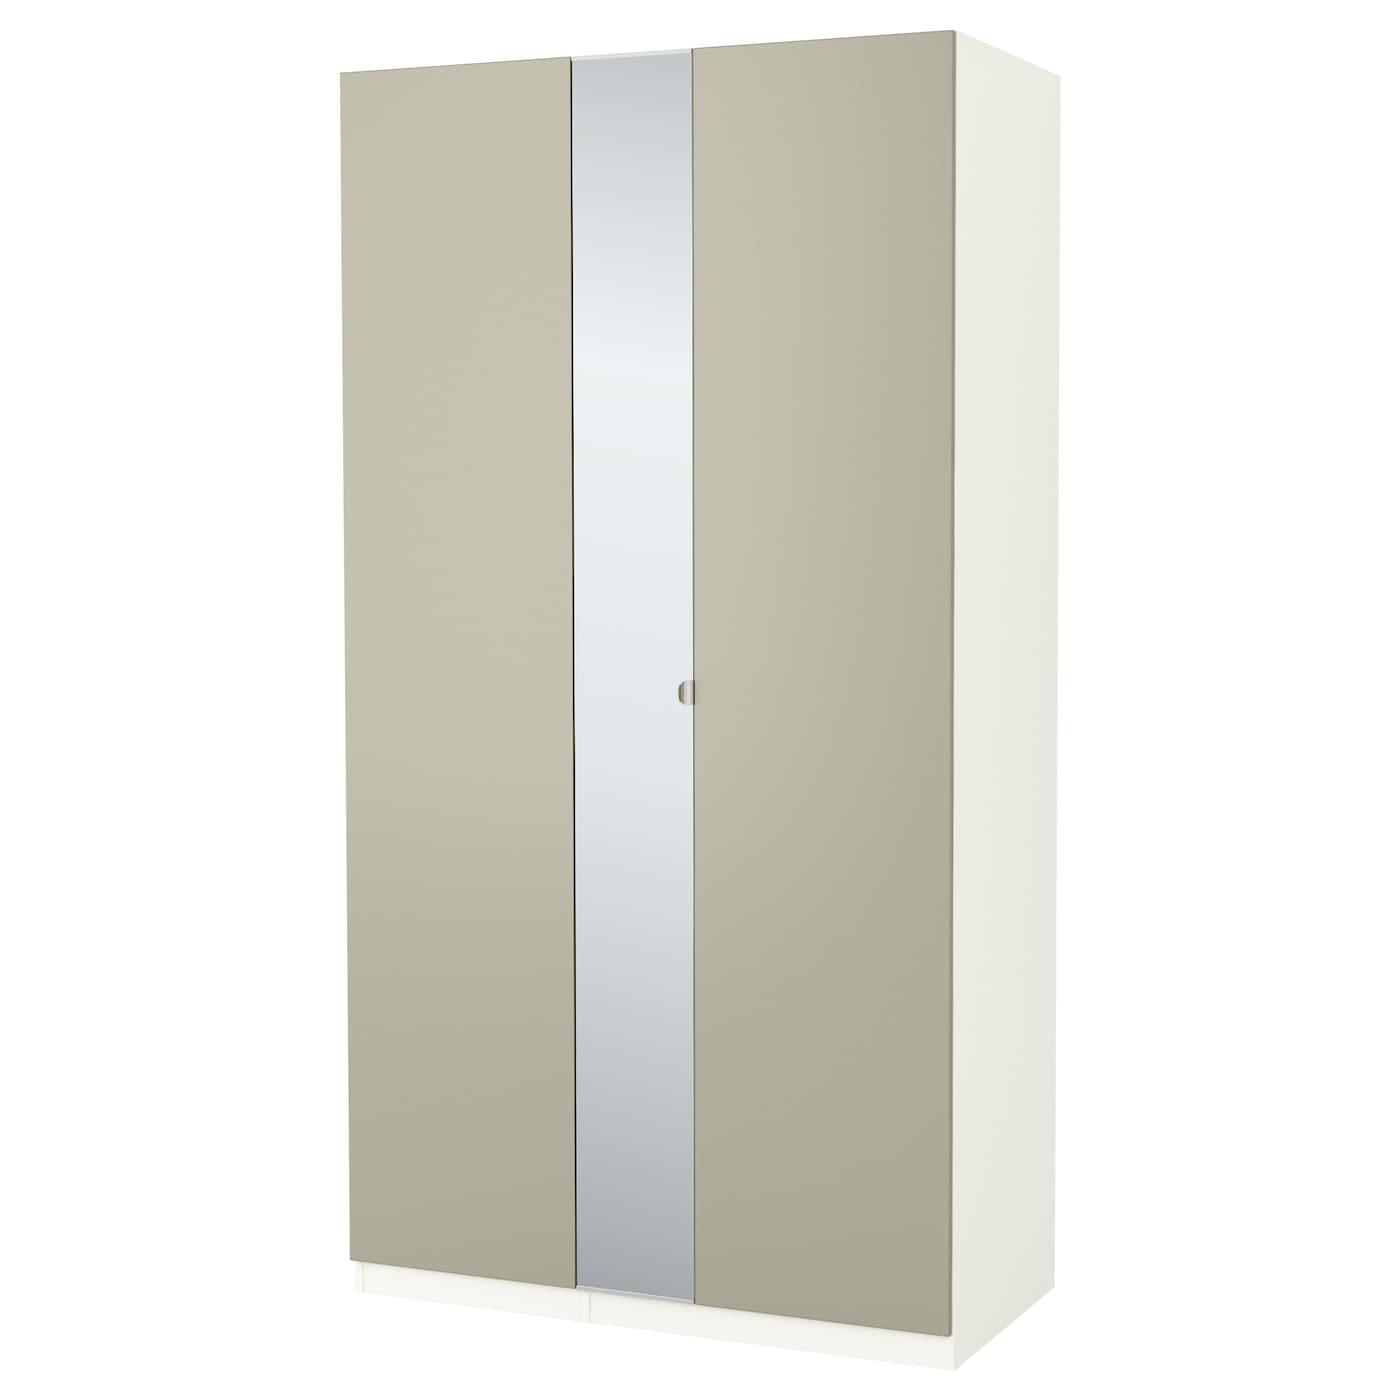 Pax Wardrobe White Forsand Vikedal 125 X 60 X 236 Cm Ikea